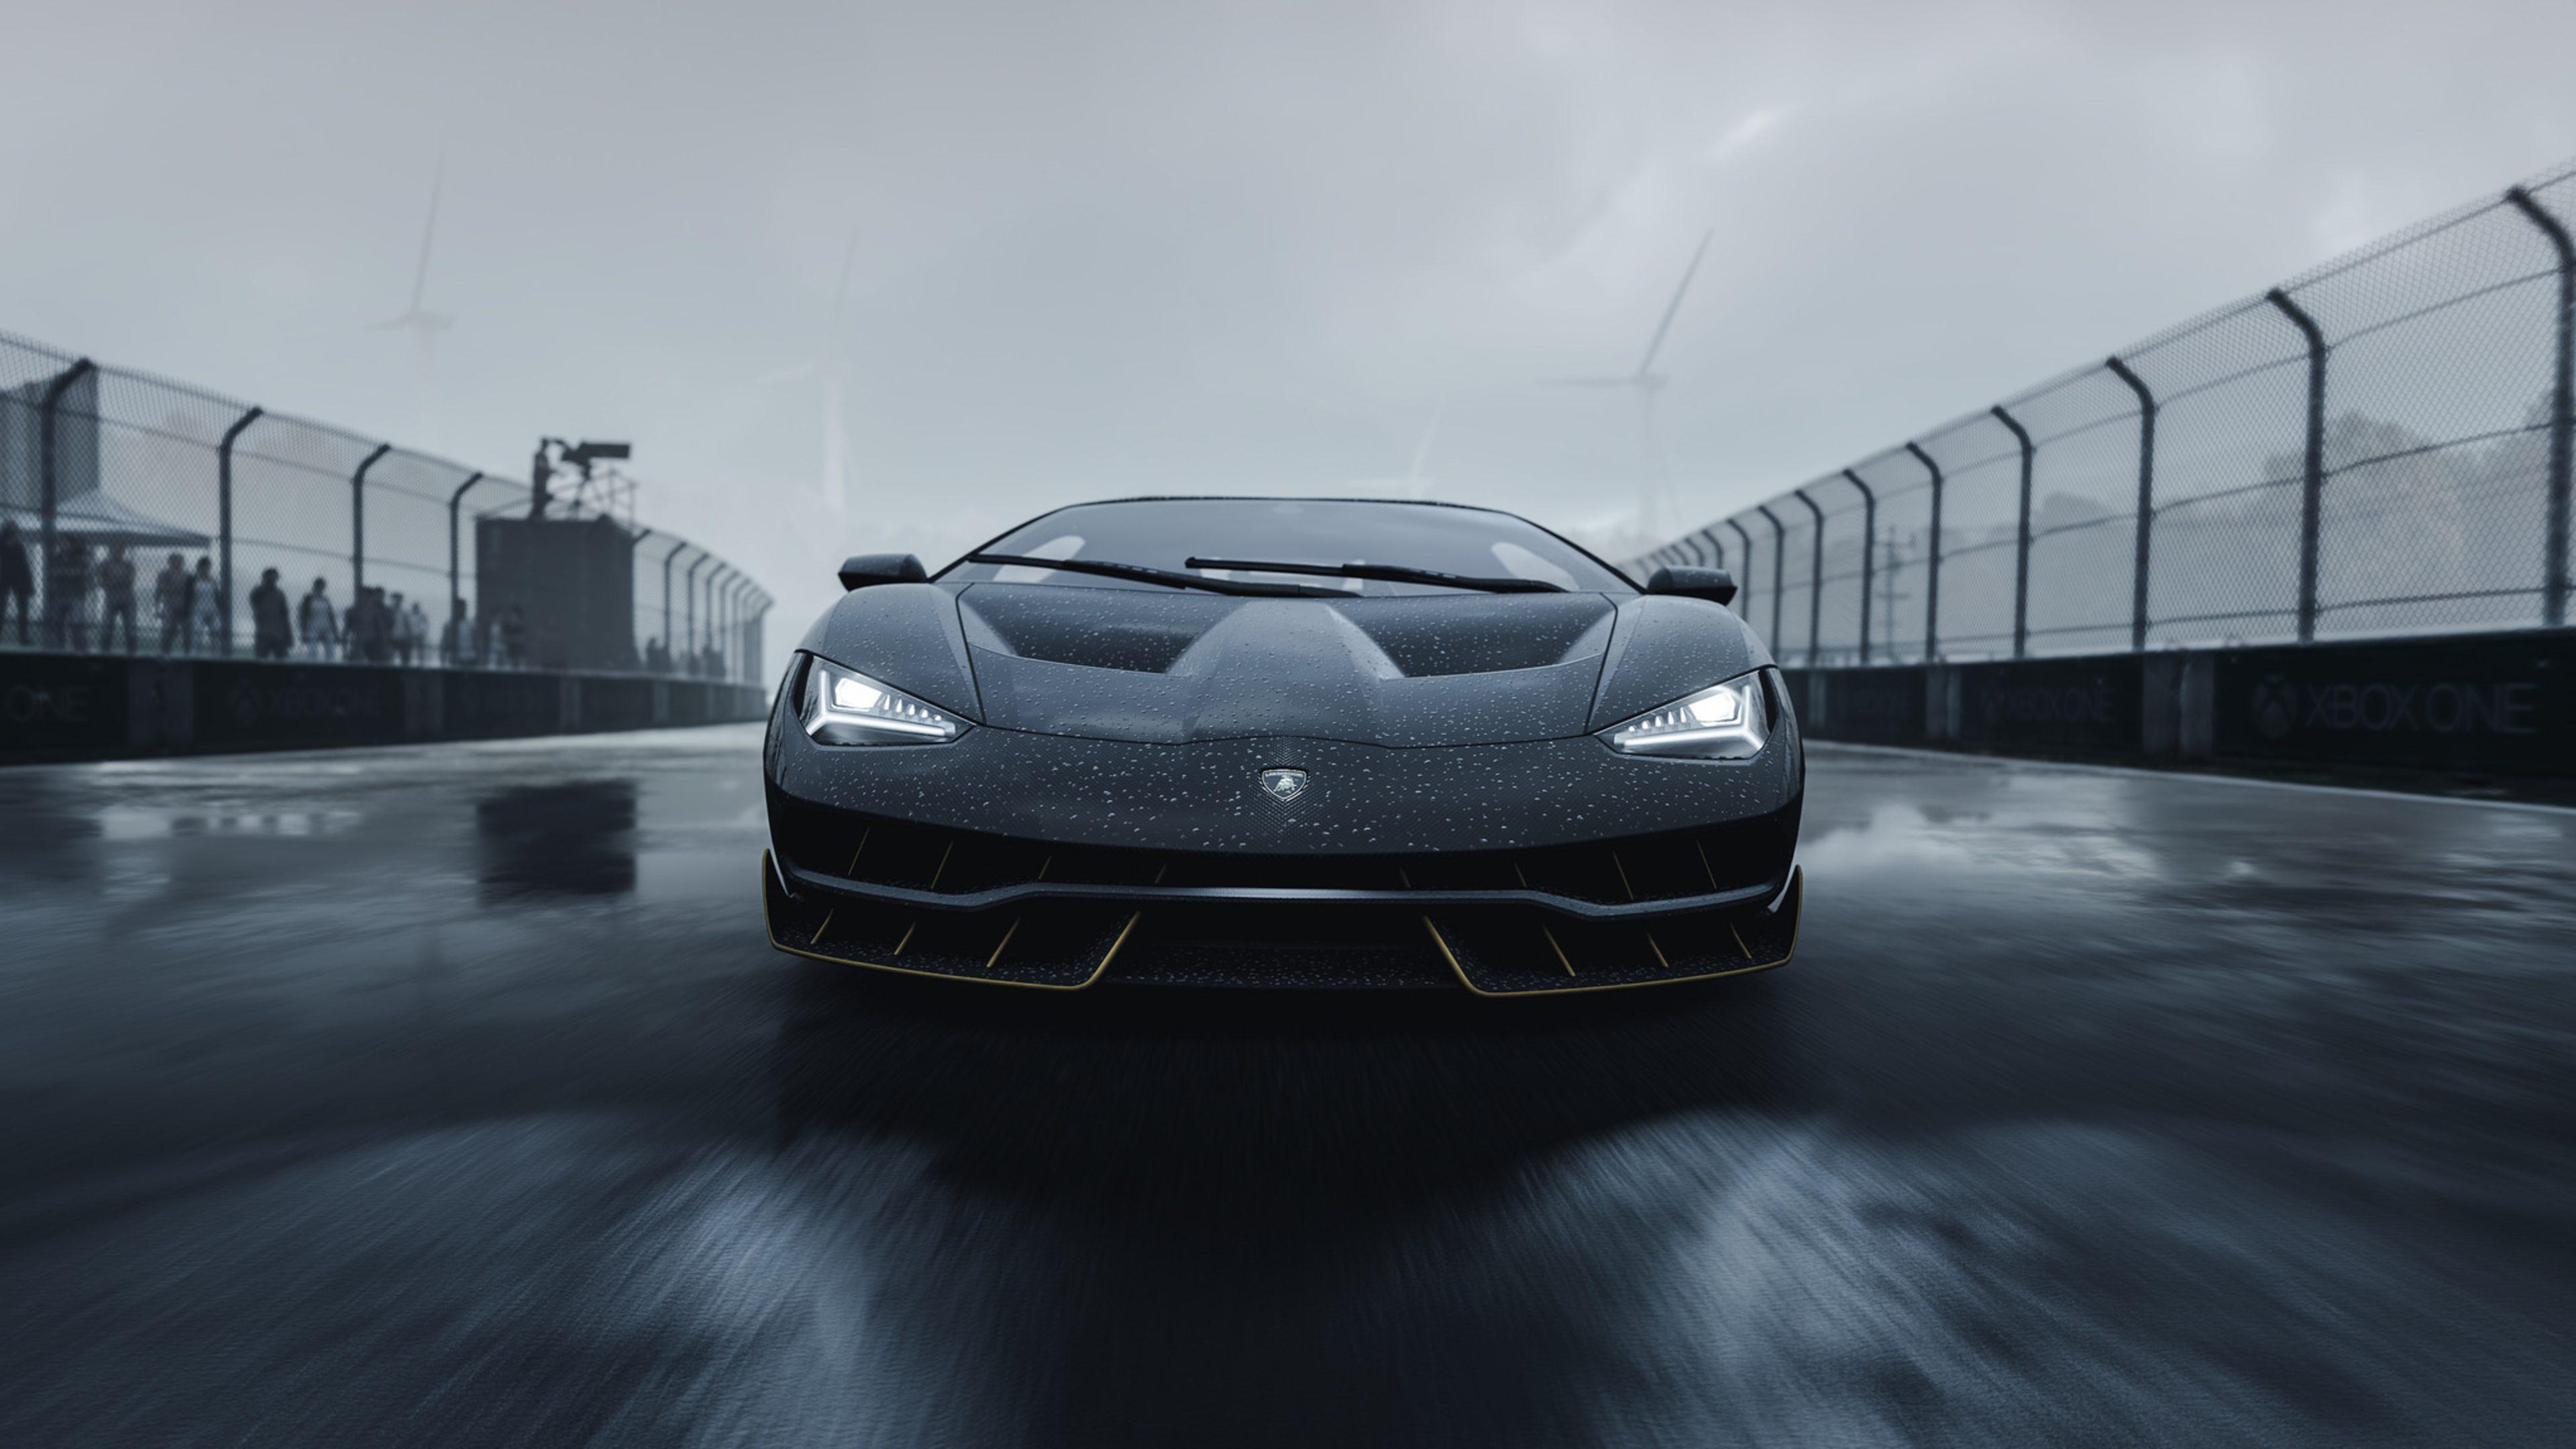 Forza Motorsport Lamborghini 4k Wallpaper Best Wallpapers